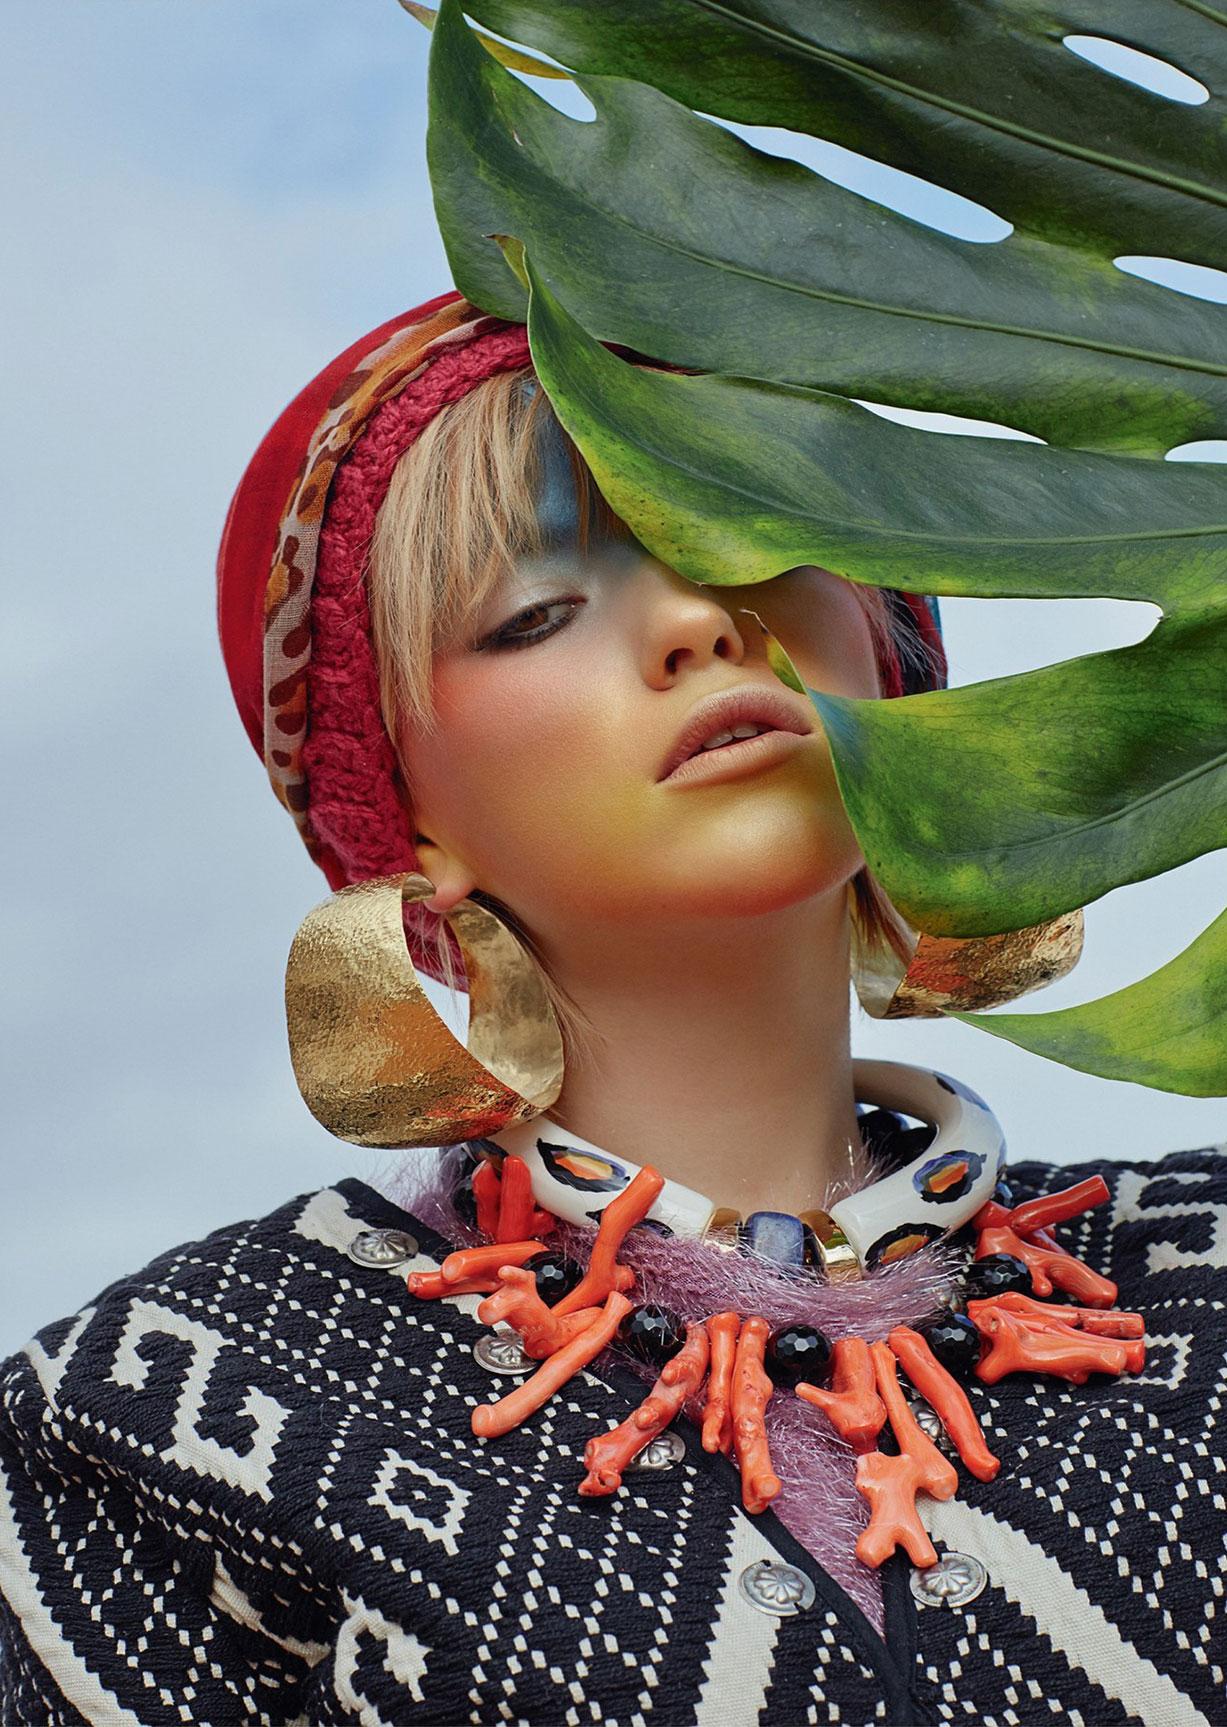 Urban Shamans / Daisy Freyja and Pablo DLacosta by Julia Buruleva